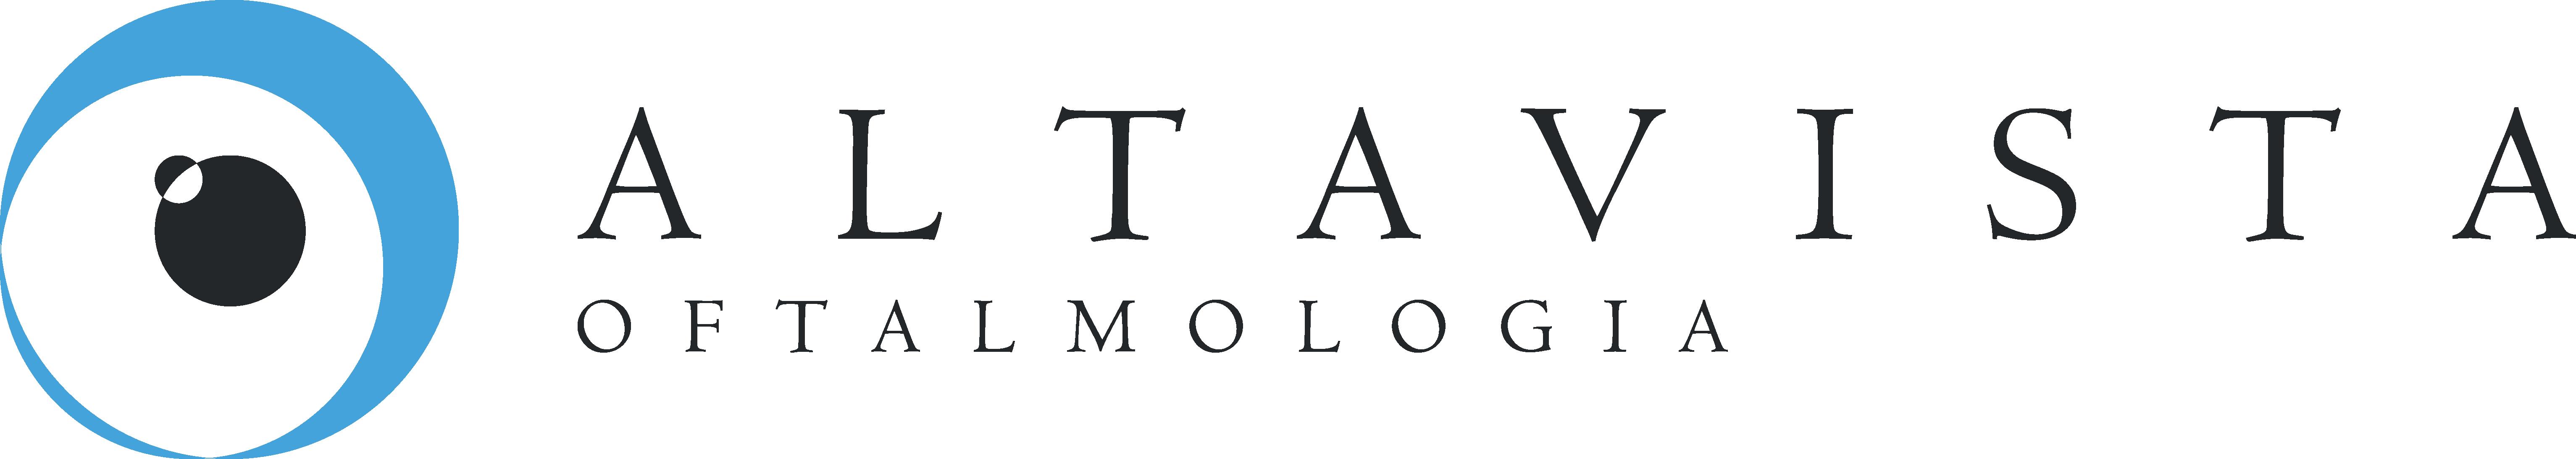 Altavista Oftalmologia